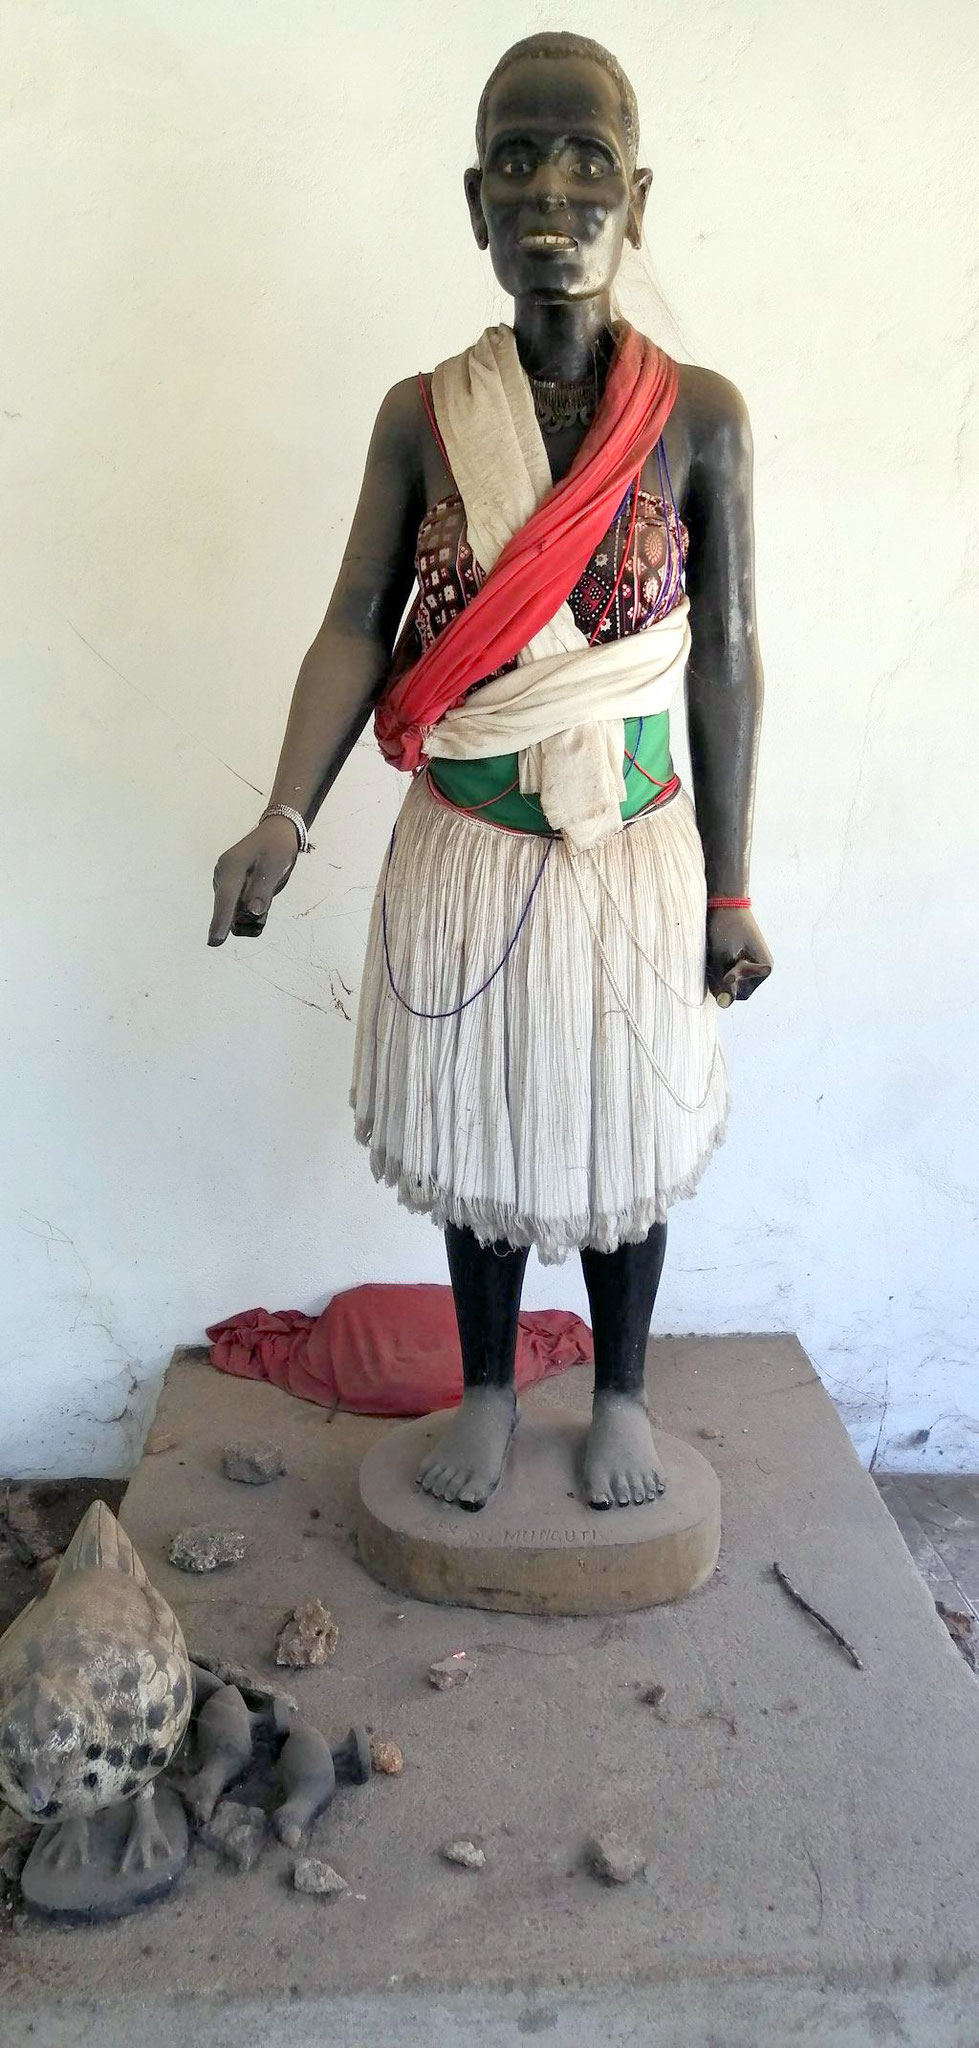 La statua d'ebano di Mekatilili wa Menza a Uhuru Garden (rinominato Mekatilili Garden) nel centro di Malindi